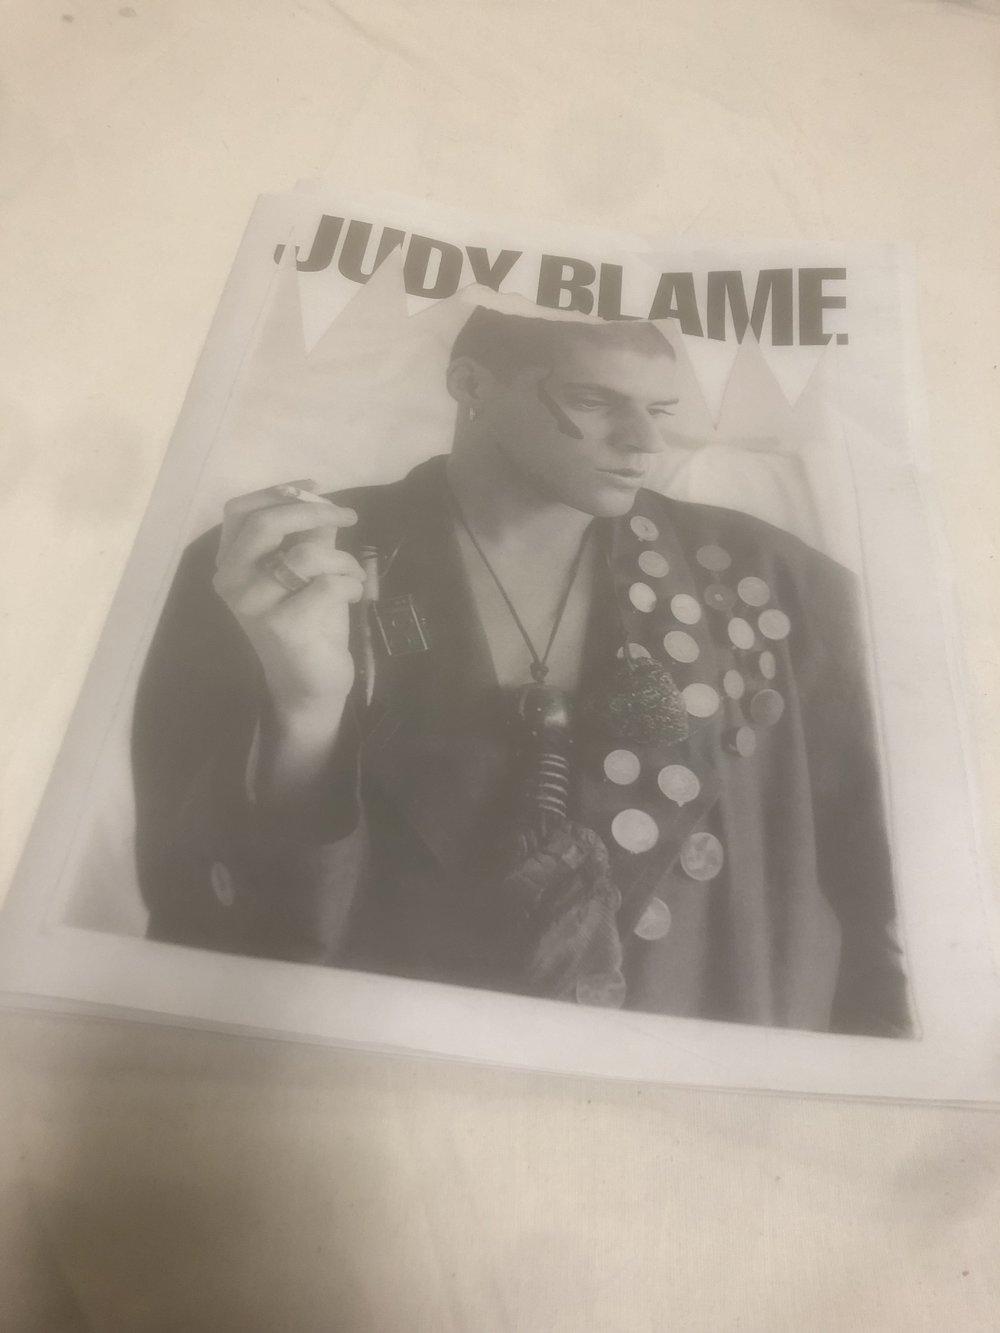 JUDY BLAME COVER .jpg